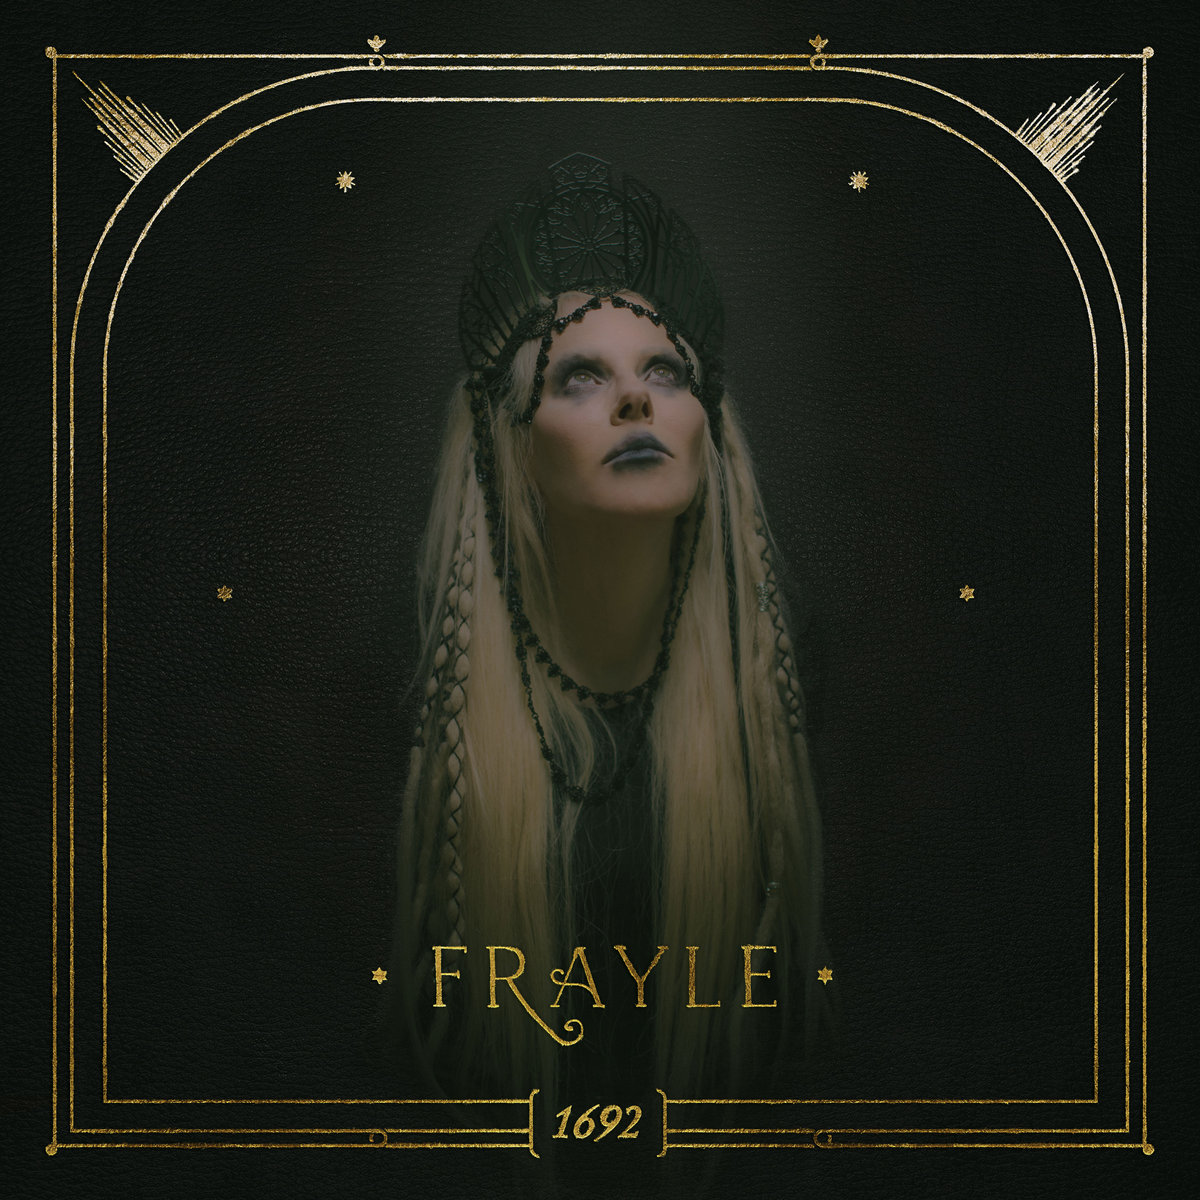 frayle-cd